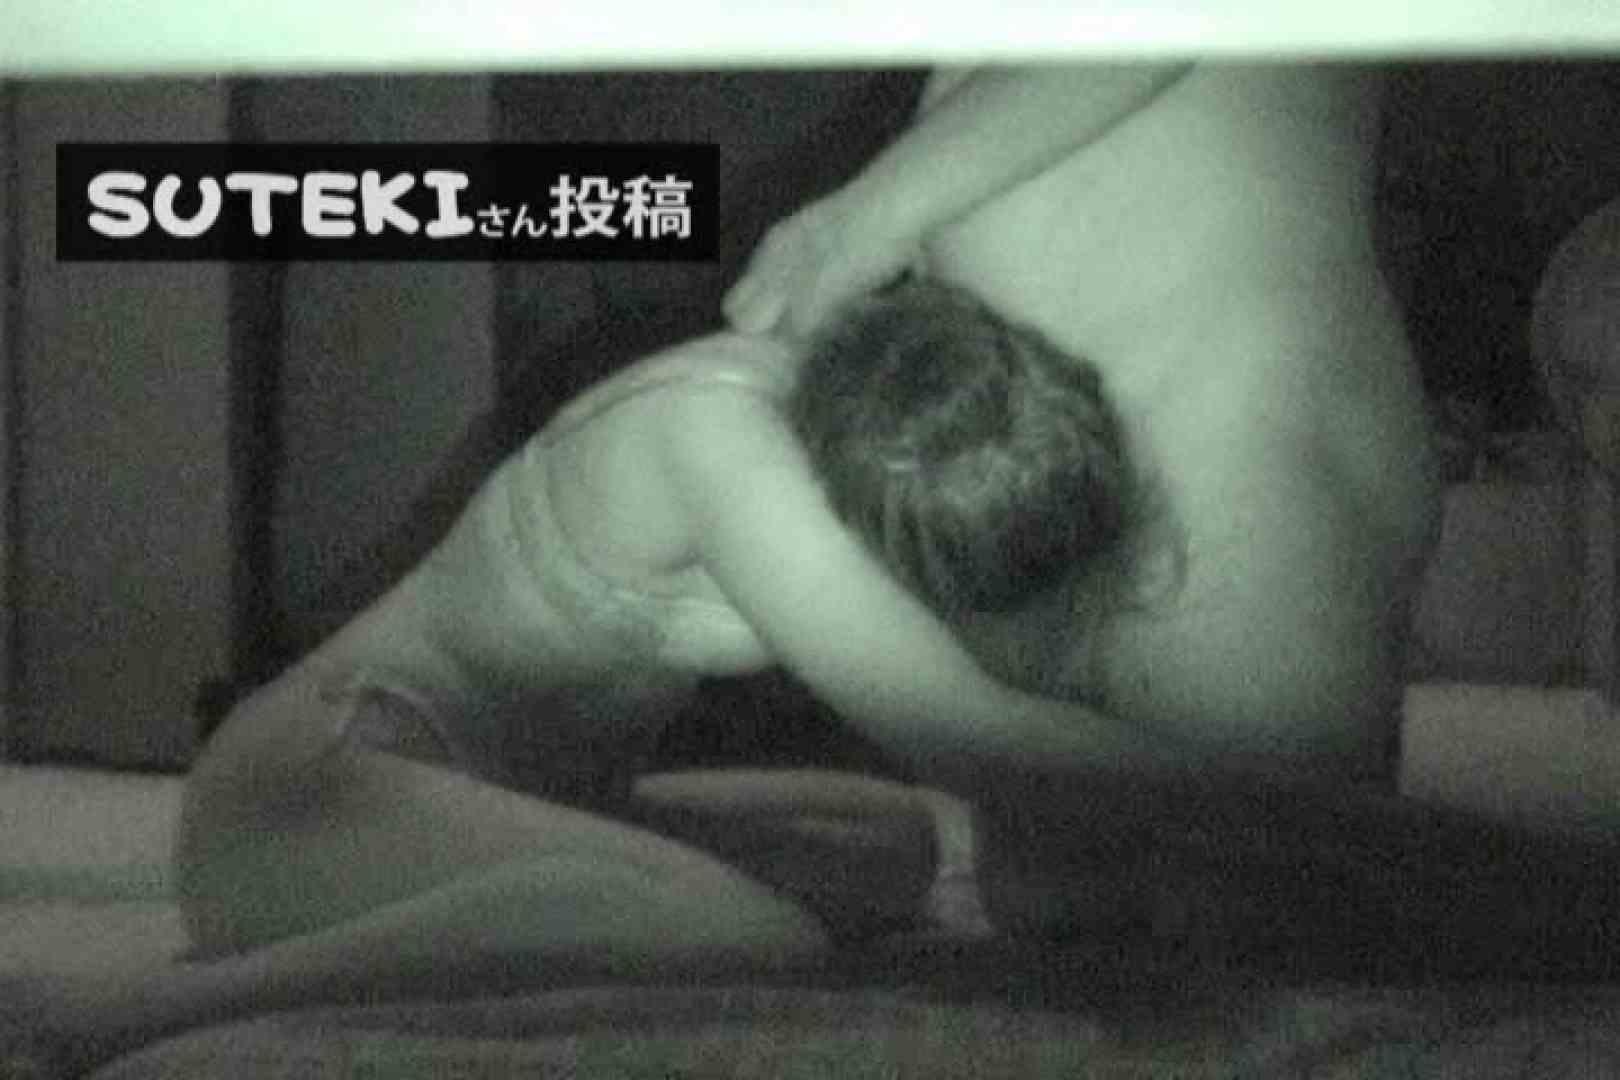 SUTEKIさん投稿 ナイトショット 盗撮 | 一般投稿  105画像 15